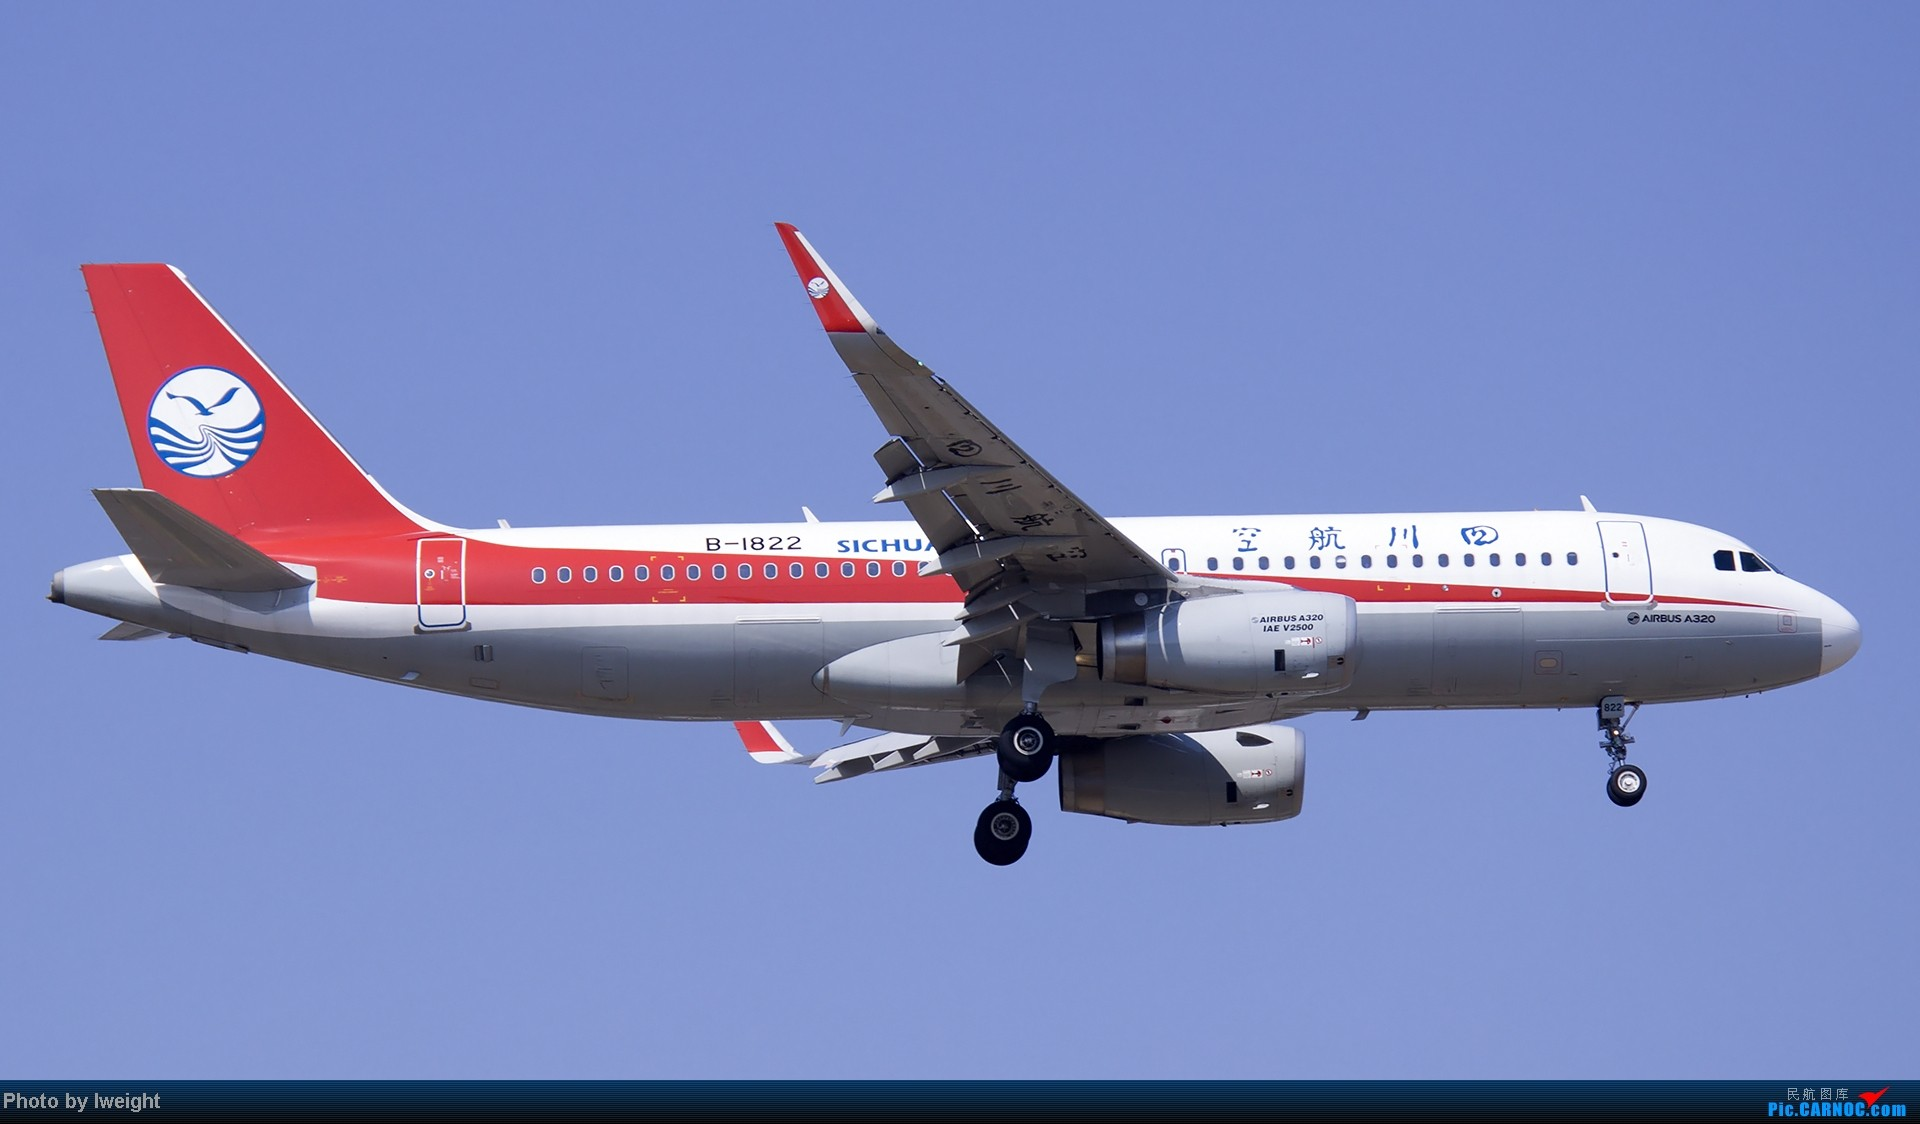 Re:[原创]北京难得的好天气,收获多种机型和彩绘,遗憾的是再次错过卡航巴塞罗那彩绘 AIRBUS A320-200 B-1822 中国北京首都机场